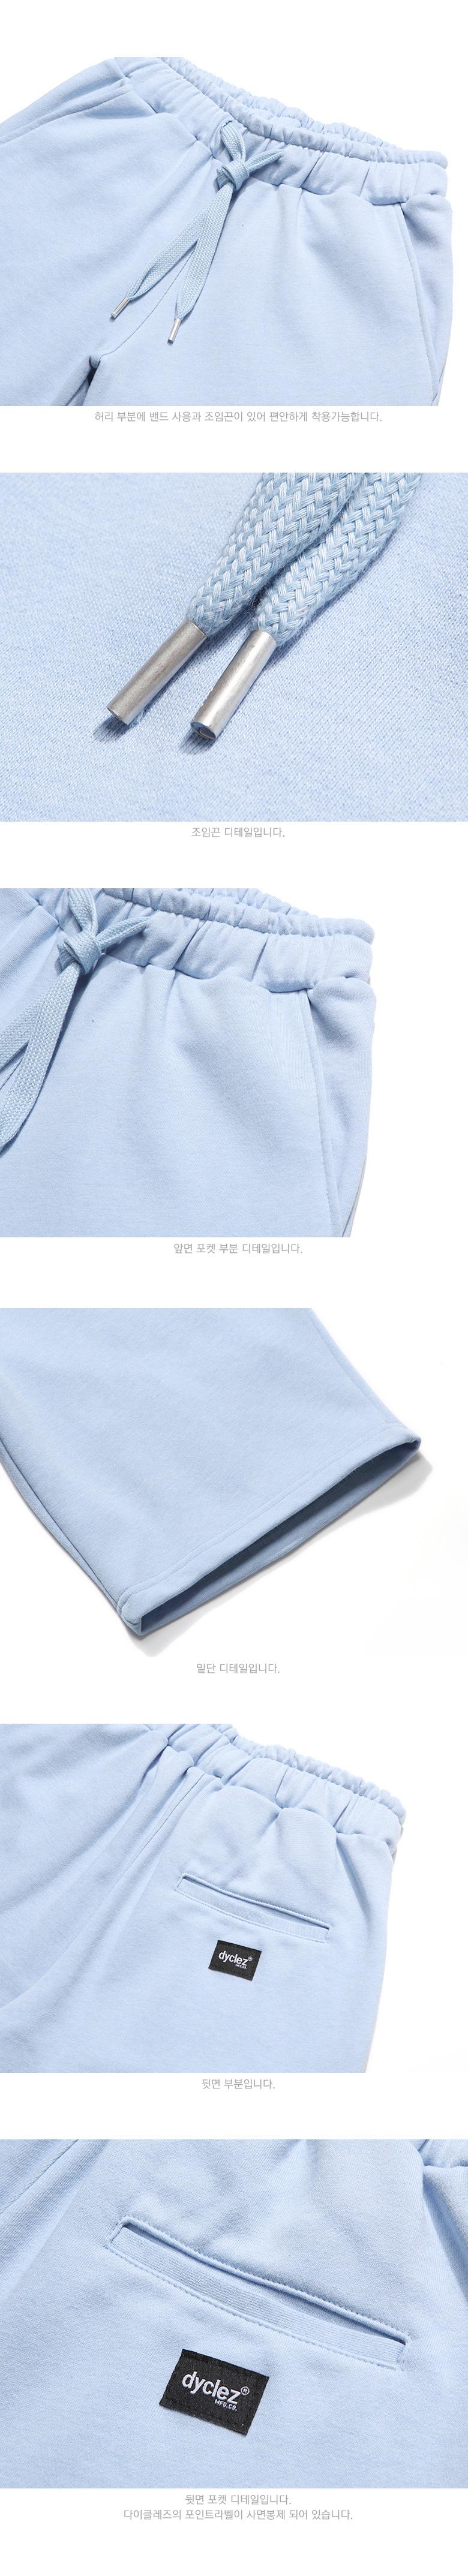 20180615_dy_classicjjuri_short_pants_detail_skyblue_uk_02.jpg